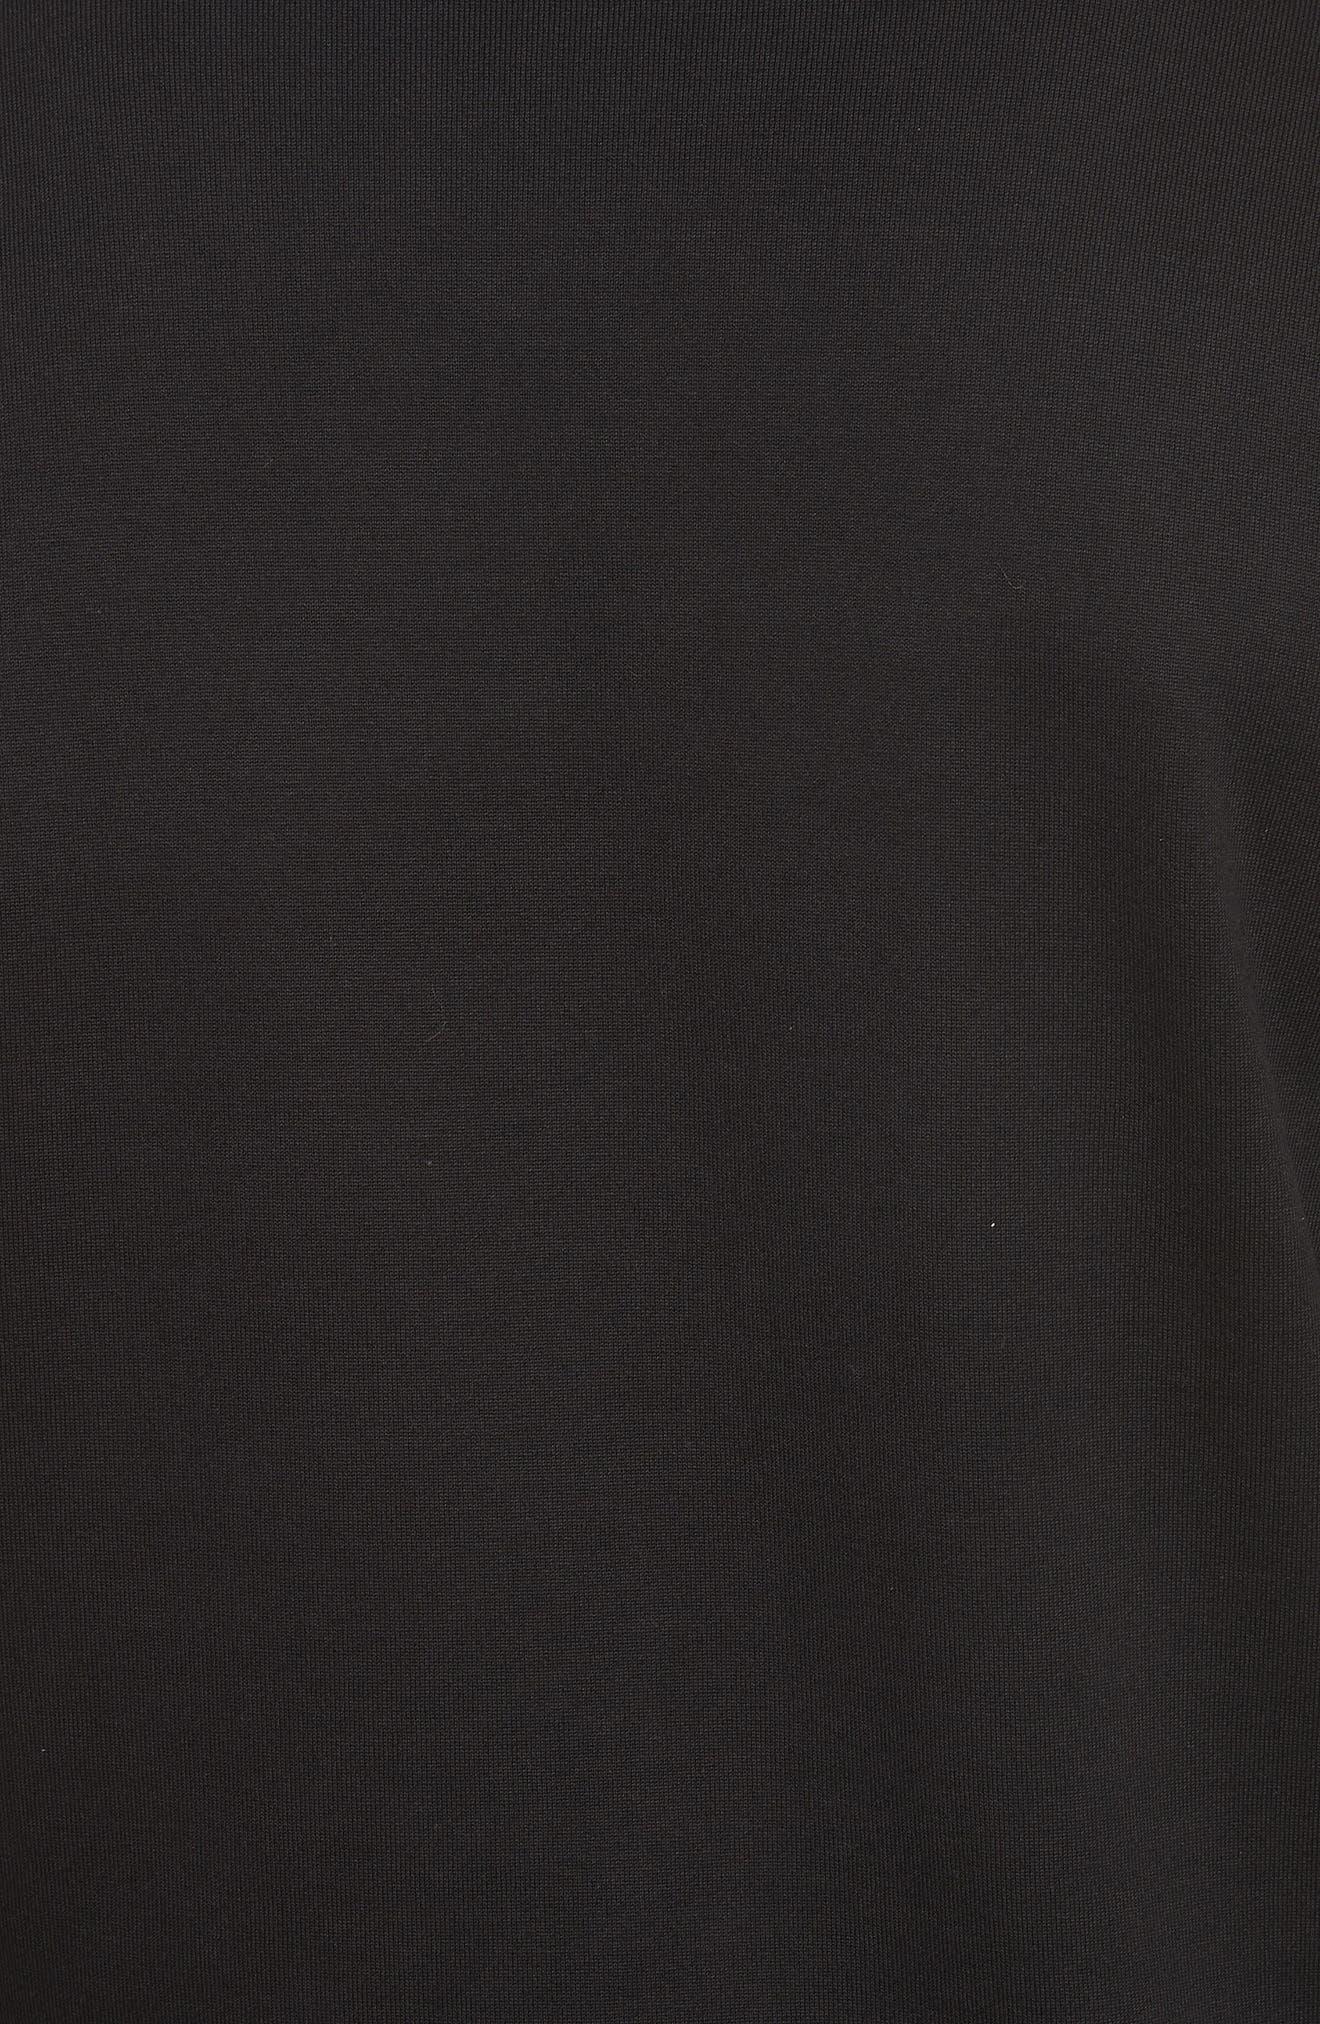 Logo Print Crewneck Sweatshirt,                             Alternate thumbnail 5, color,                             Black